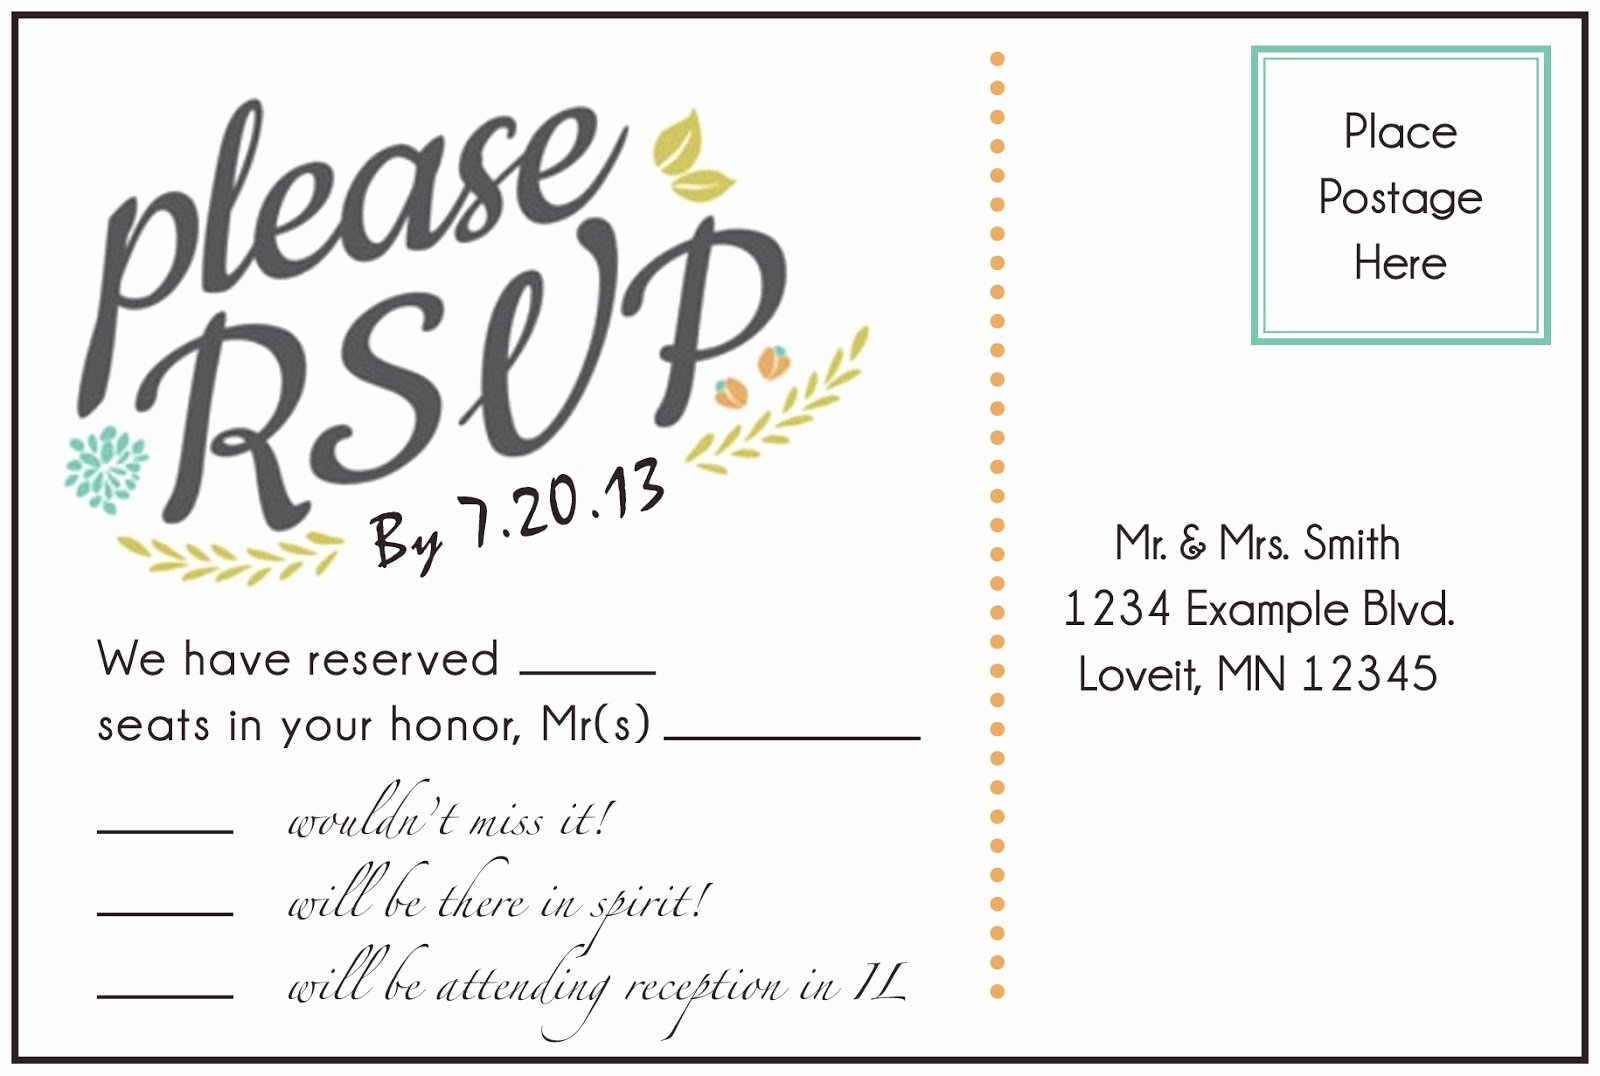 Wedding Rsvp Postcards Template Elegant 6 Best Of Able Postcard Templates Free Gift